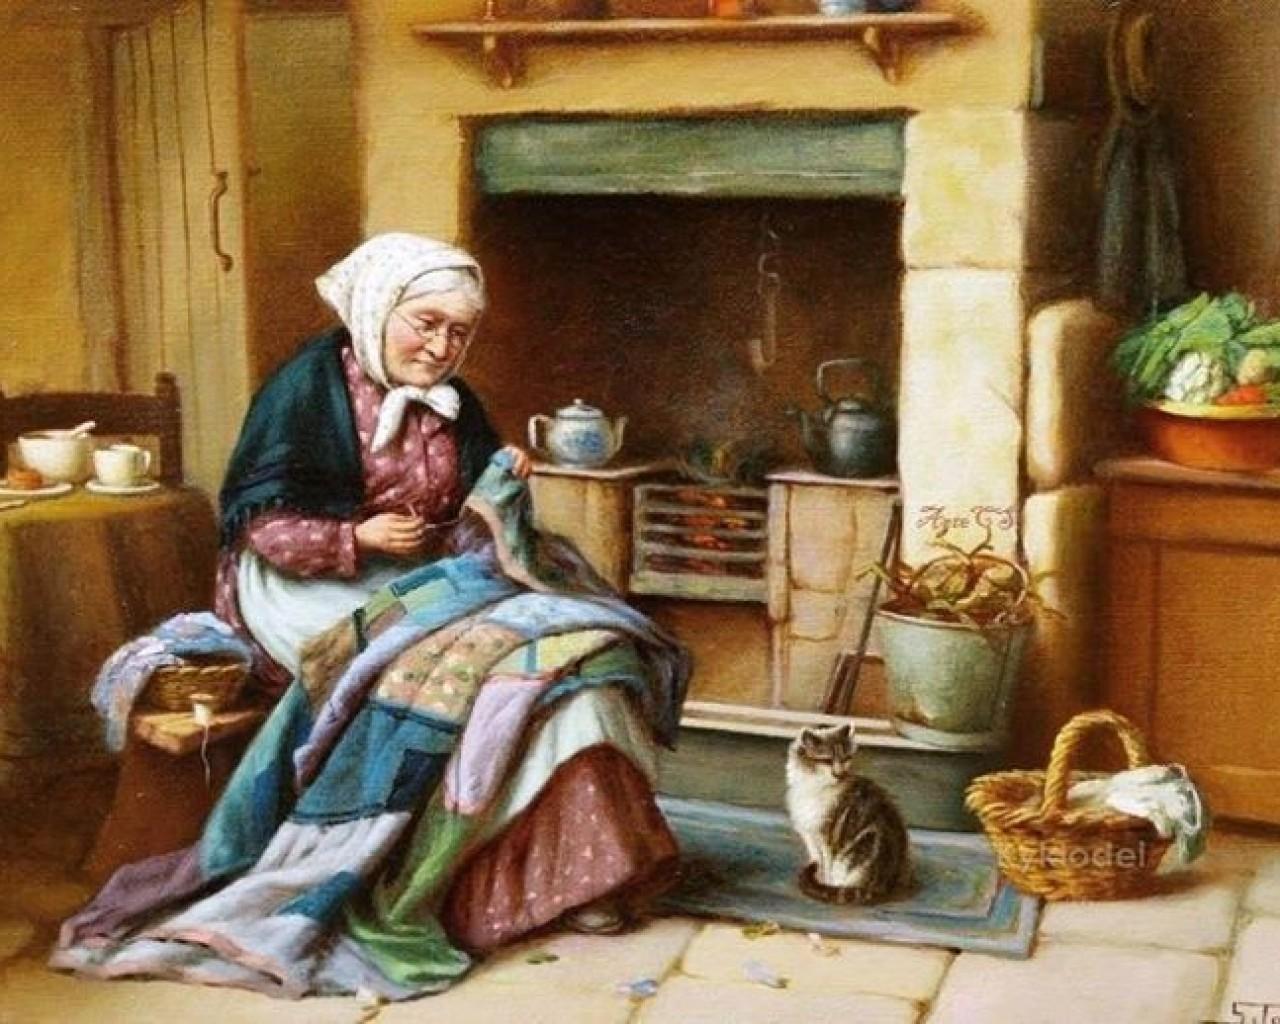 E:\Декада 15.12.2015г\Для урока\Картинки на печать\grandmother_lovely_house_knitting_cat_stove_hd-wallpaper-1563317.jpg